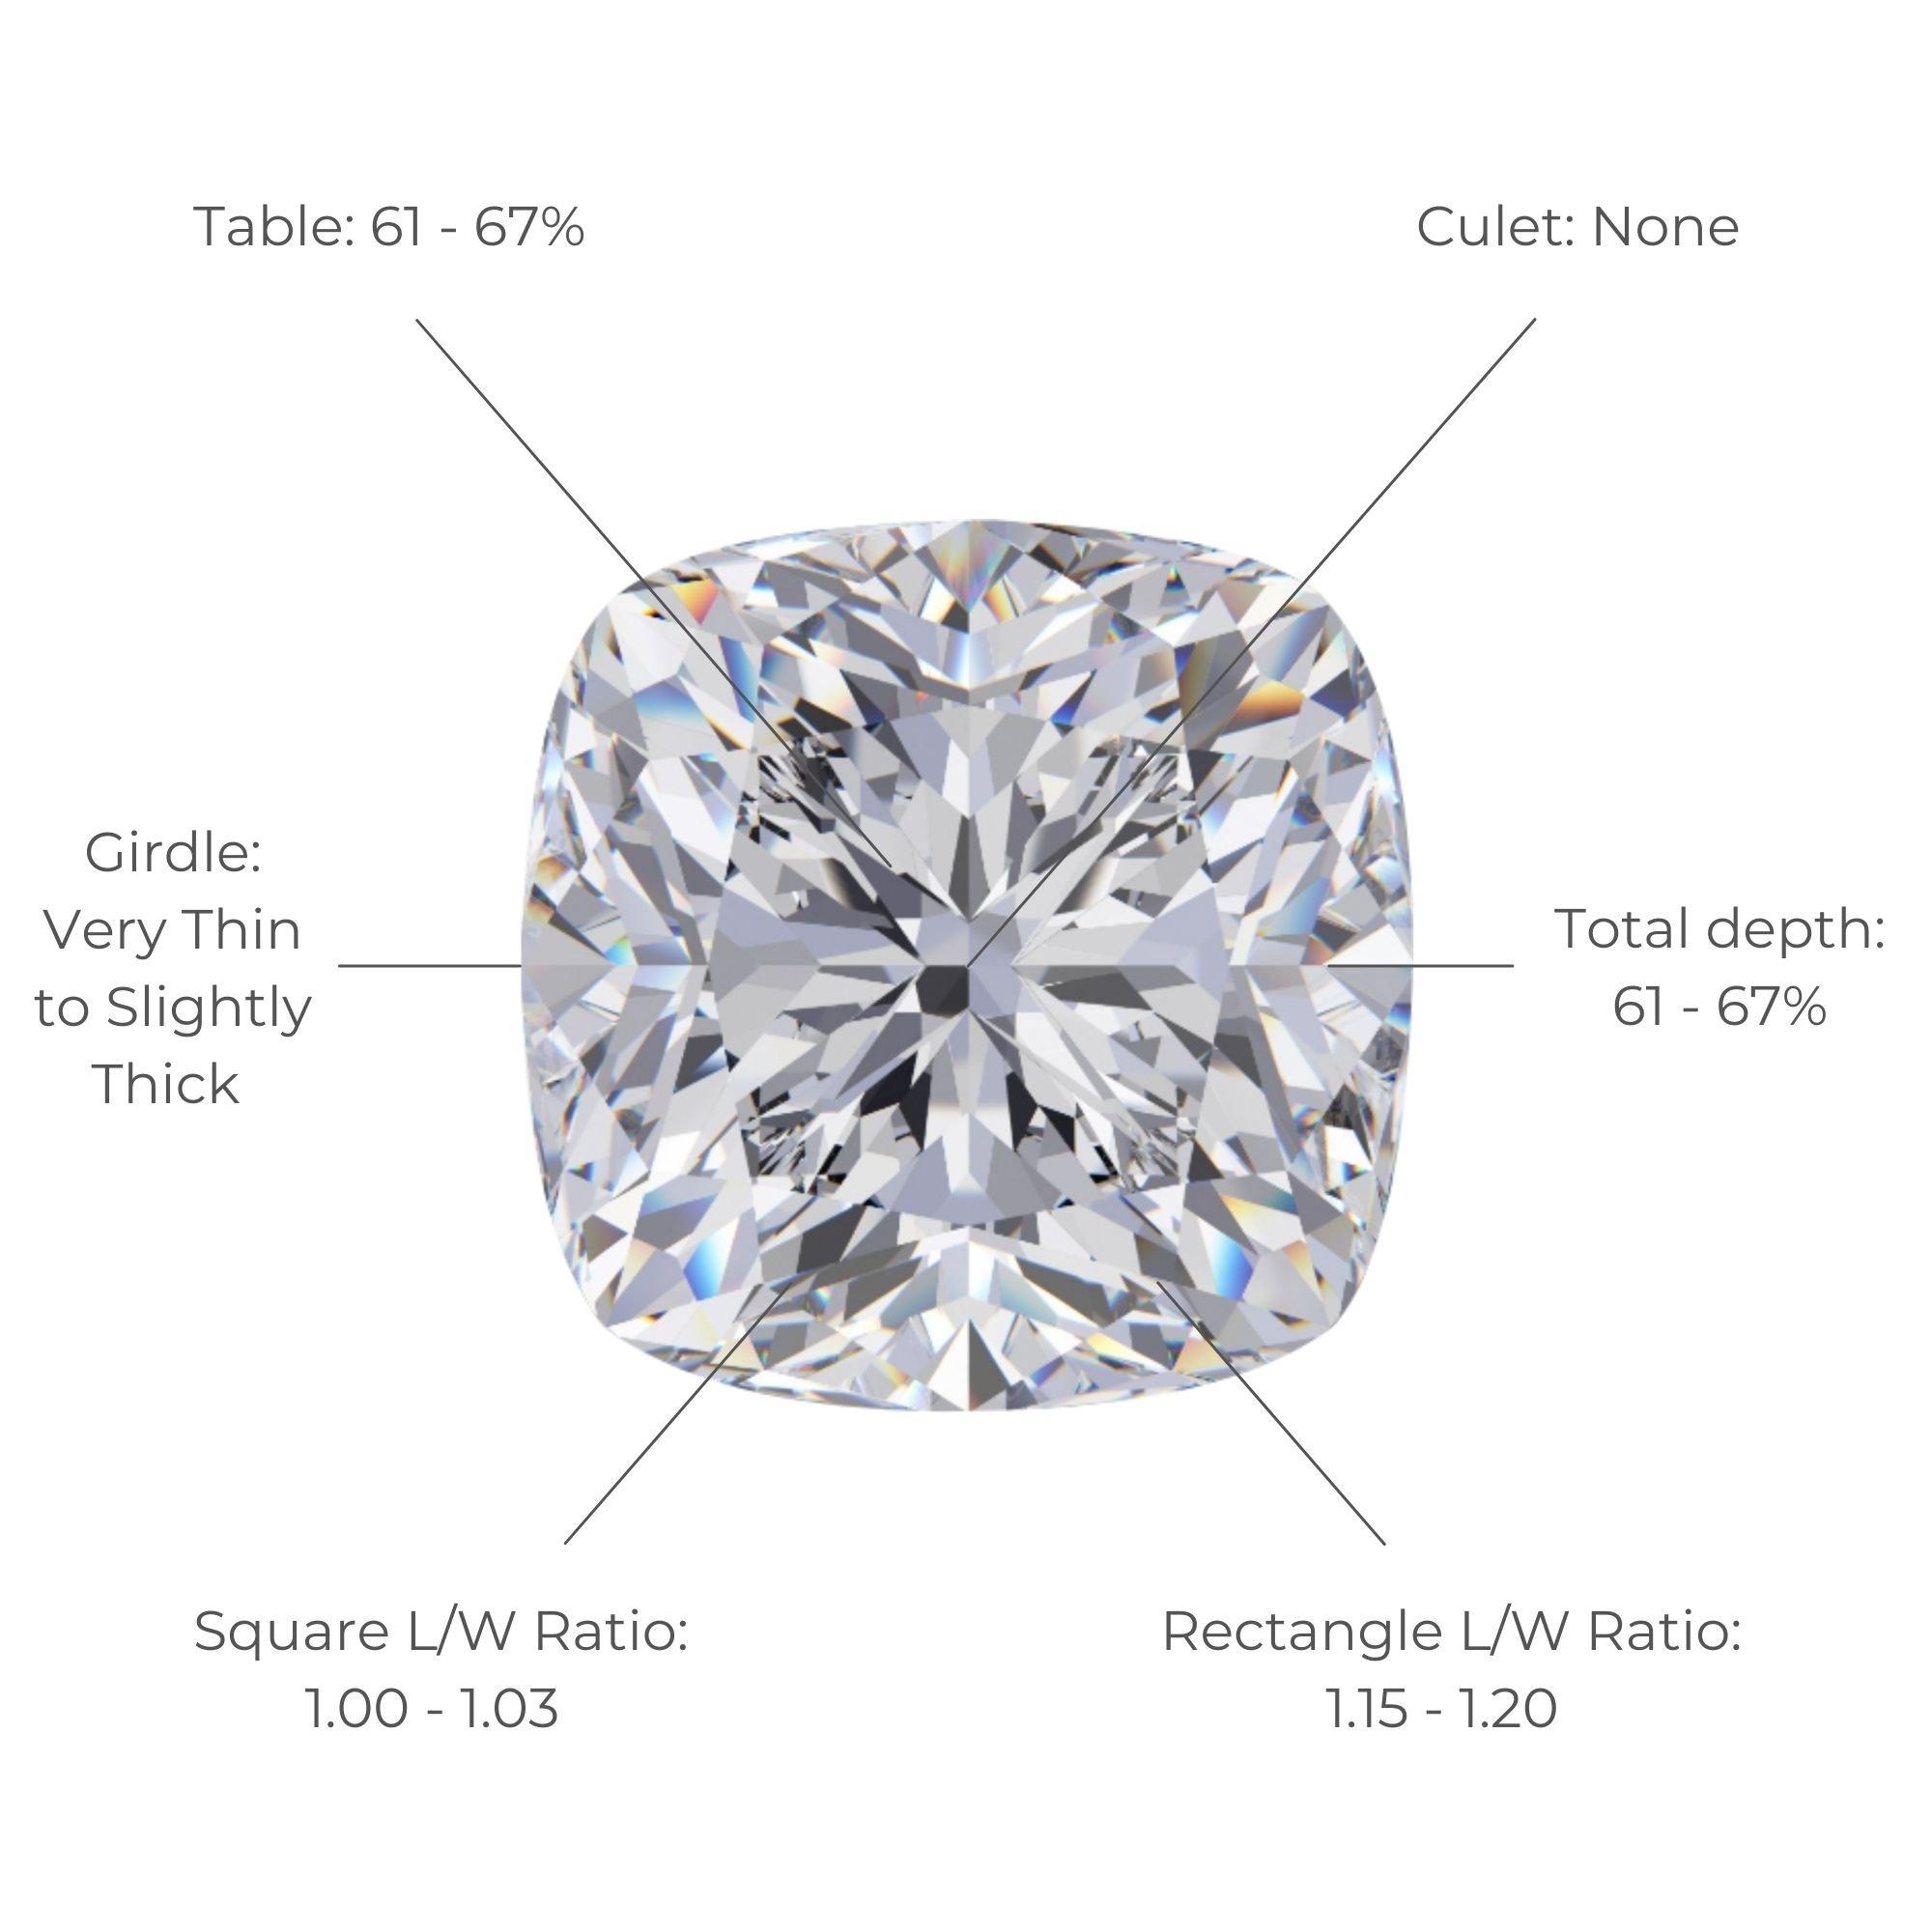 Ideal Cushion Cut Diamond Proportions | Diamond Buzz